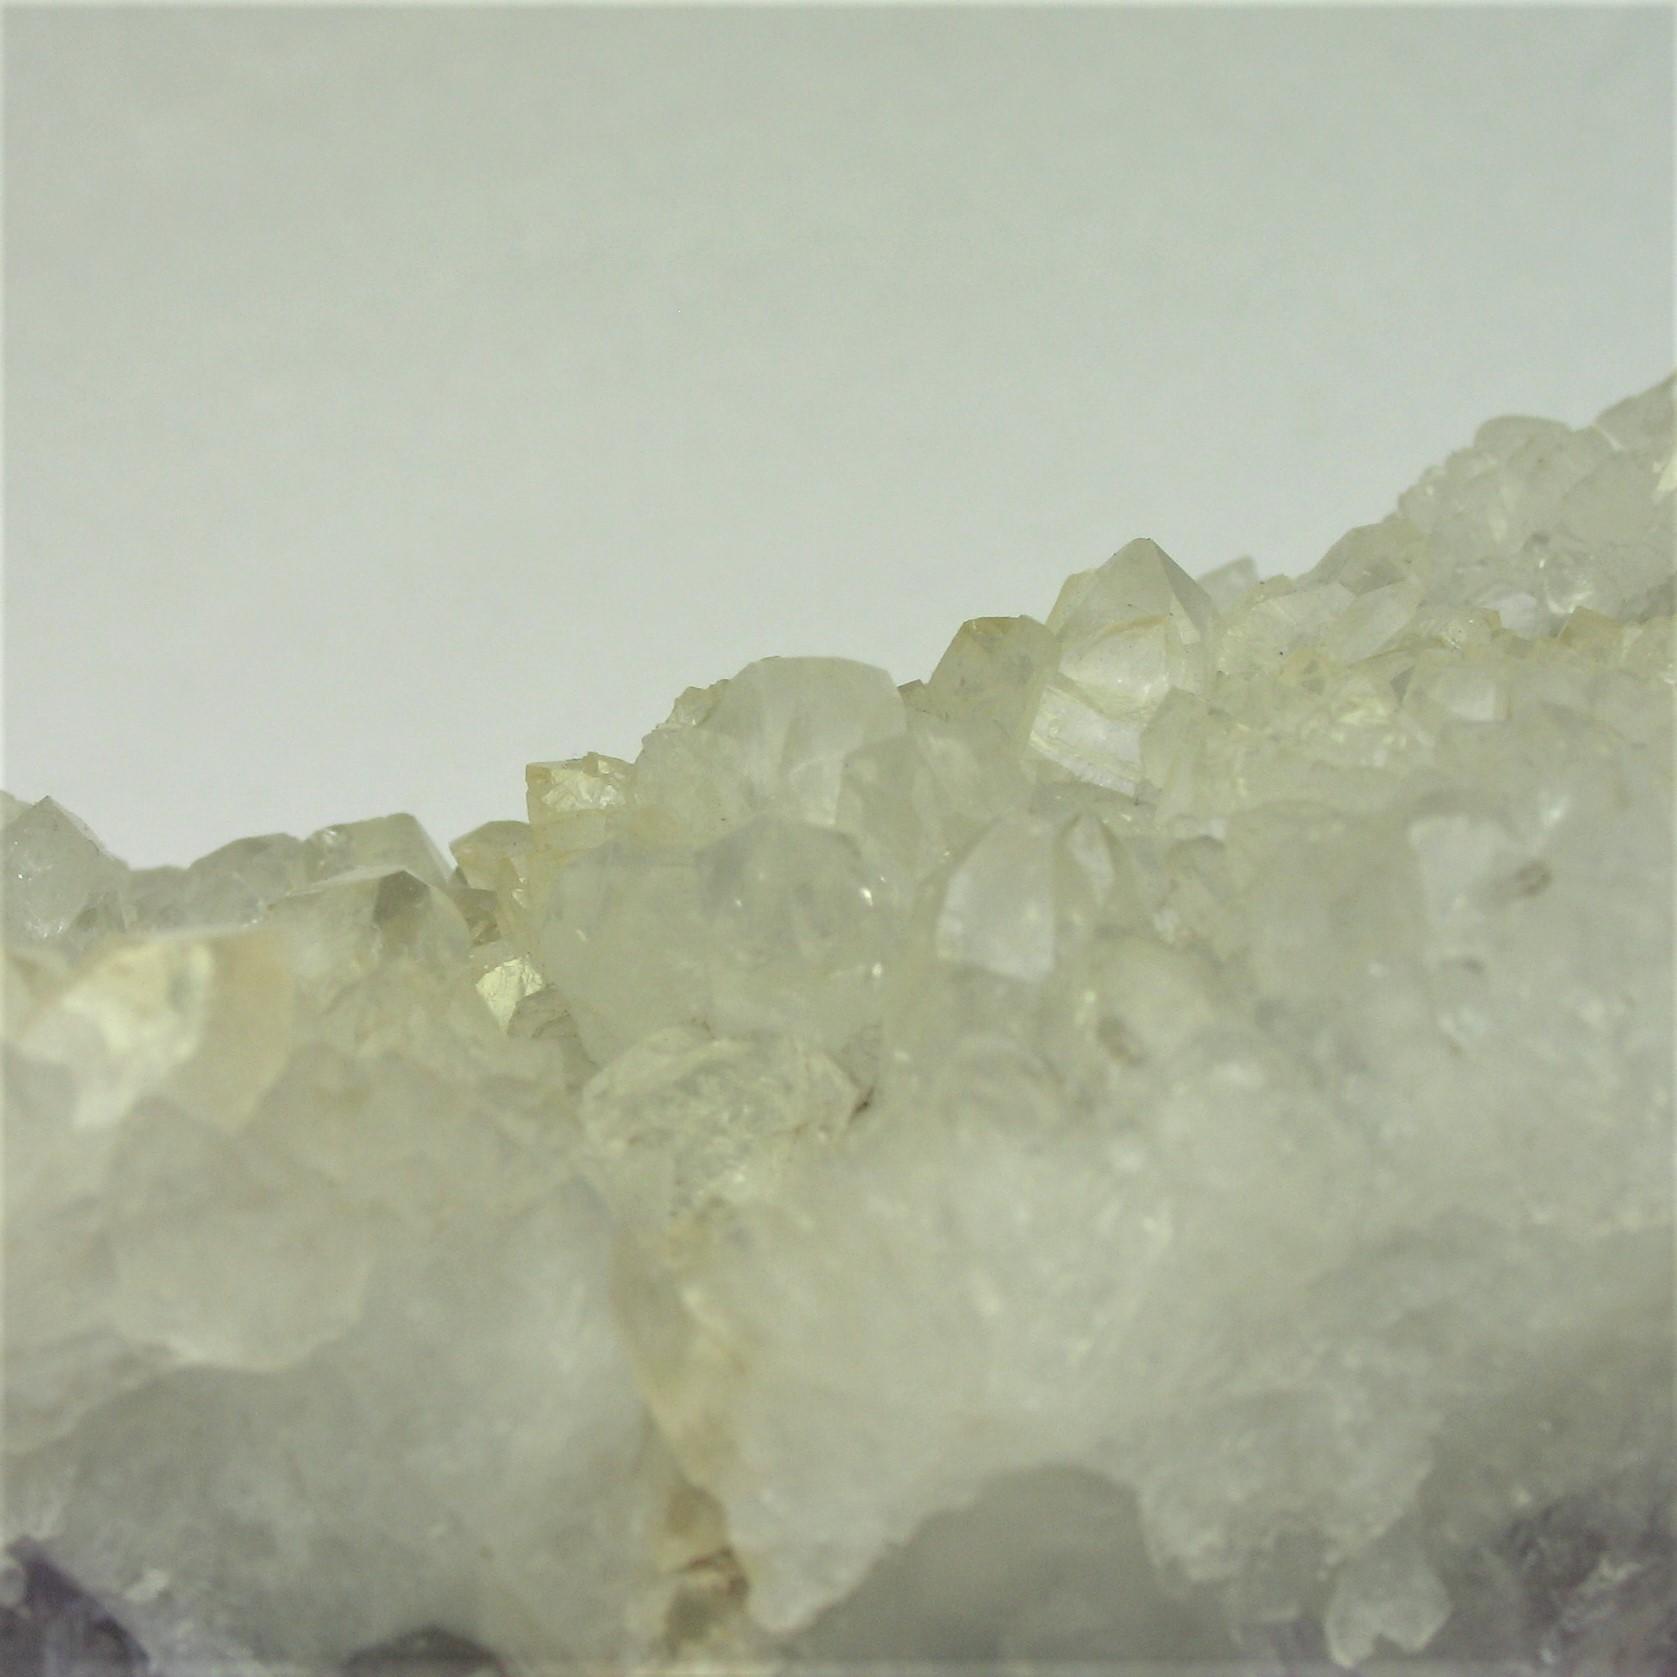 Ruwe bergkristal